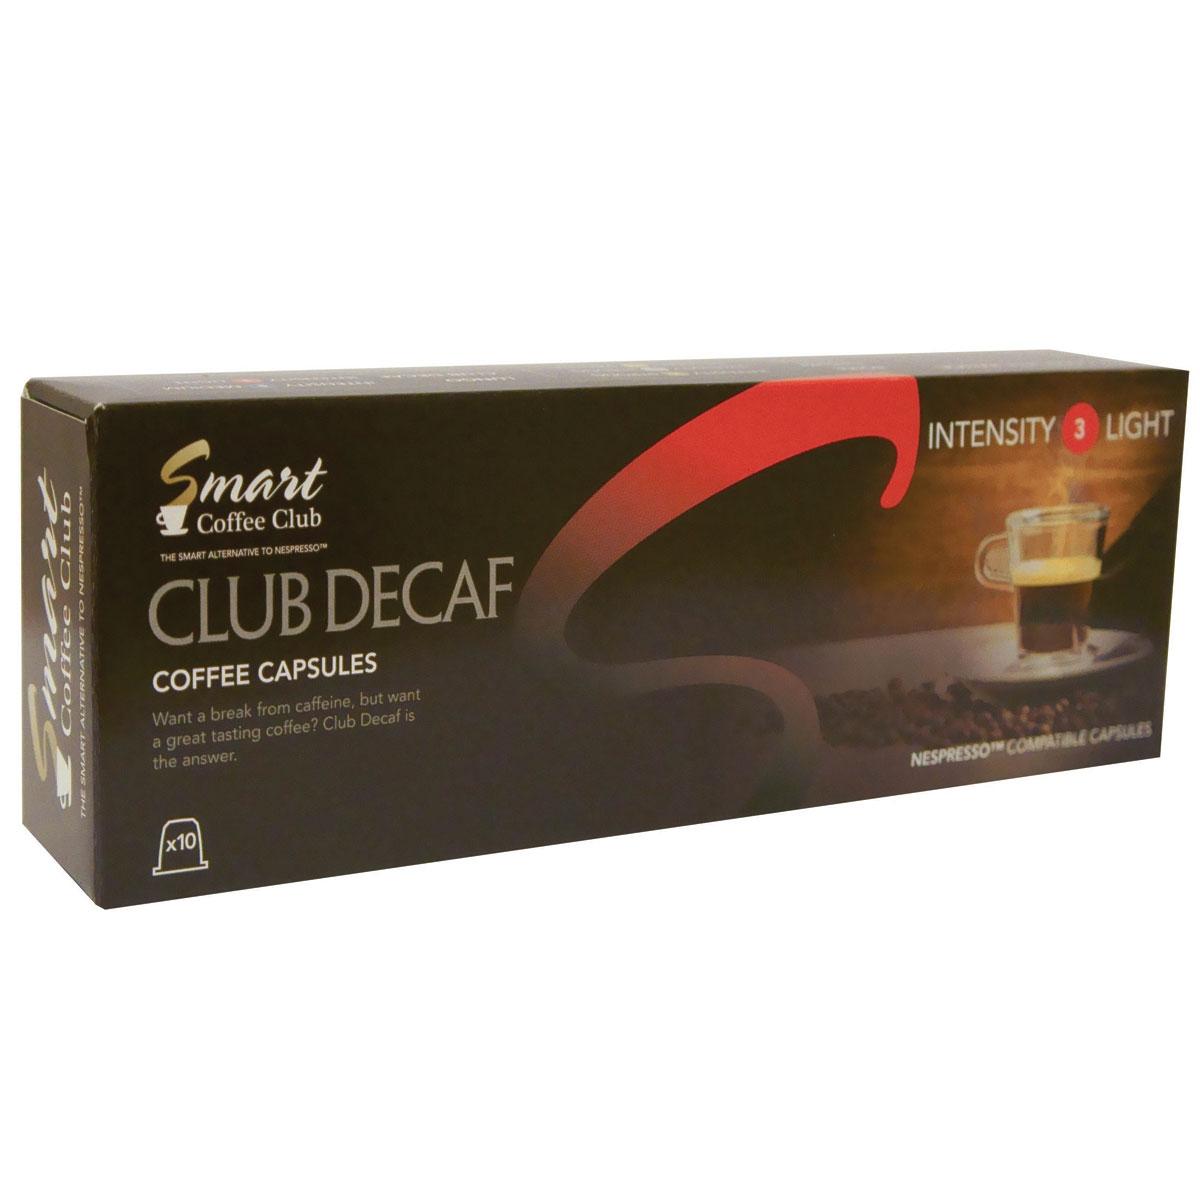 Smart Coffee Club Decaf кофе в капсулах, 10 штук платье alyssa coffee